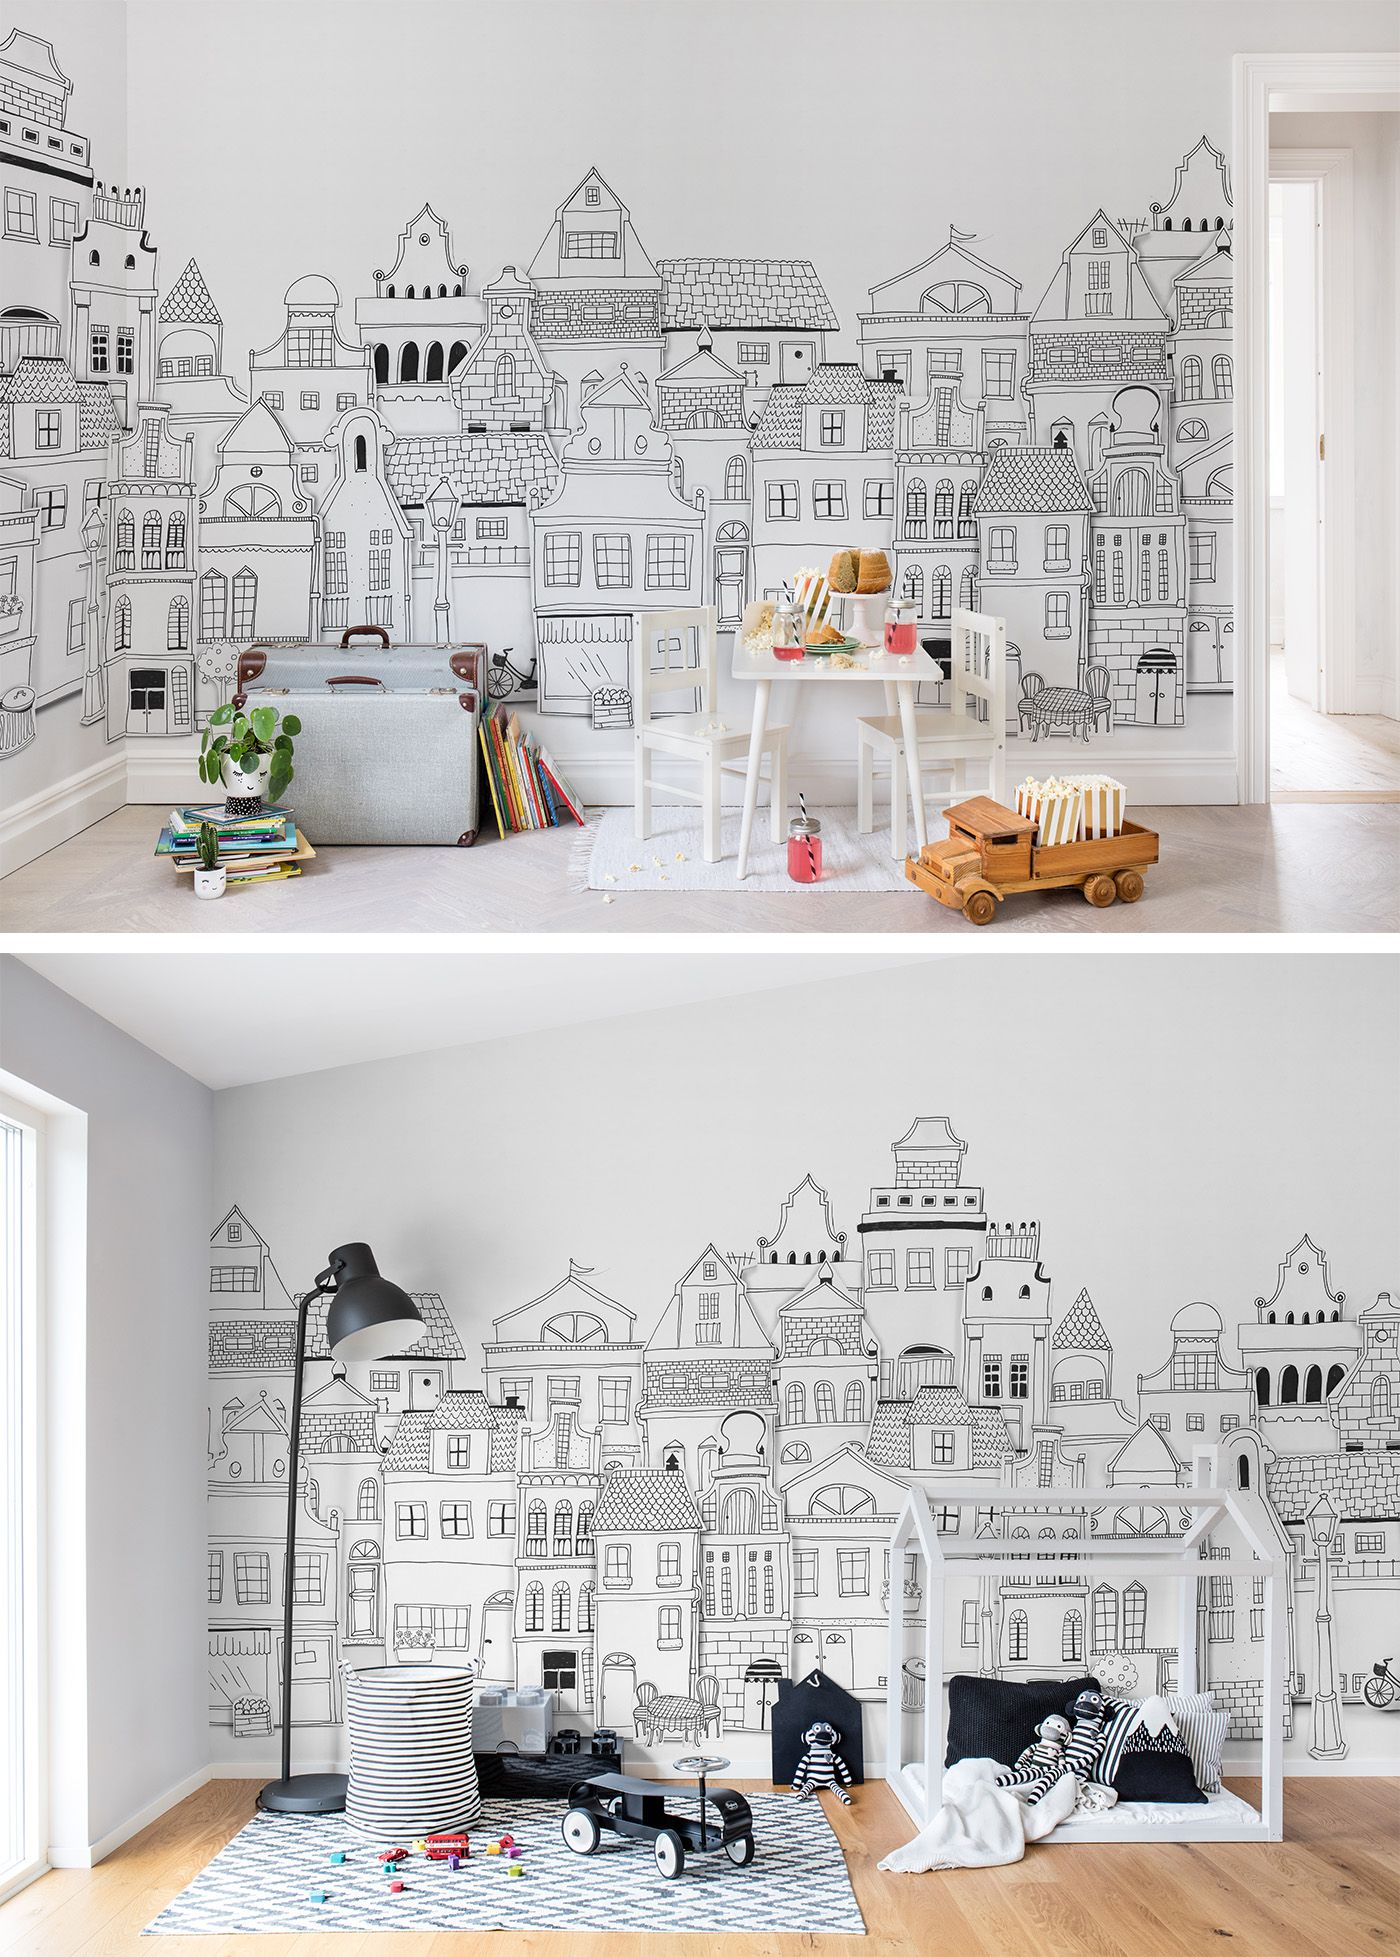 Full Size of Kinderzimmer Wanddeko London Houses Tapete Küche Sofa Regal Regale Weiß Kinderzimmer Kinderzimmer Wanddeko